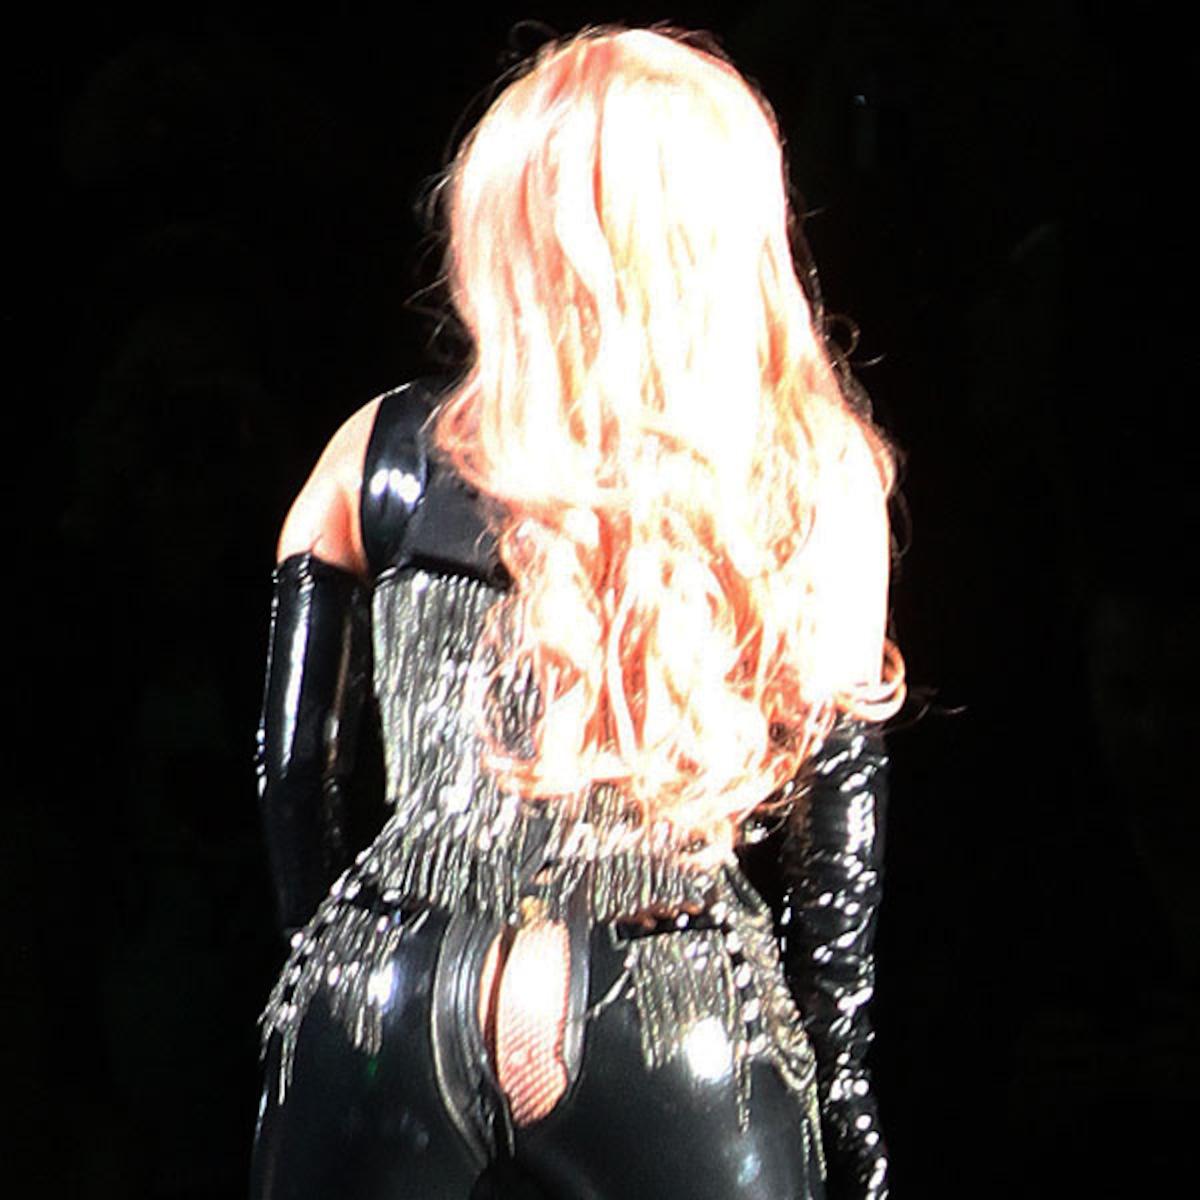 Lady Gaga Bare Butt photo 26